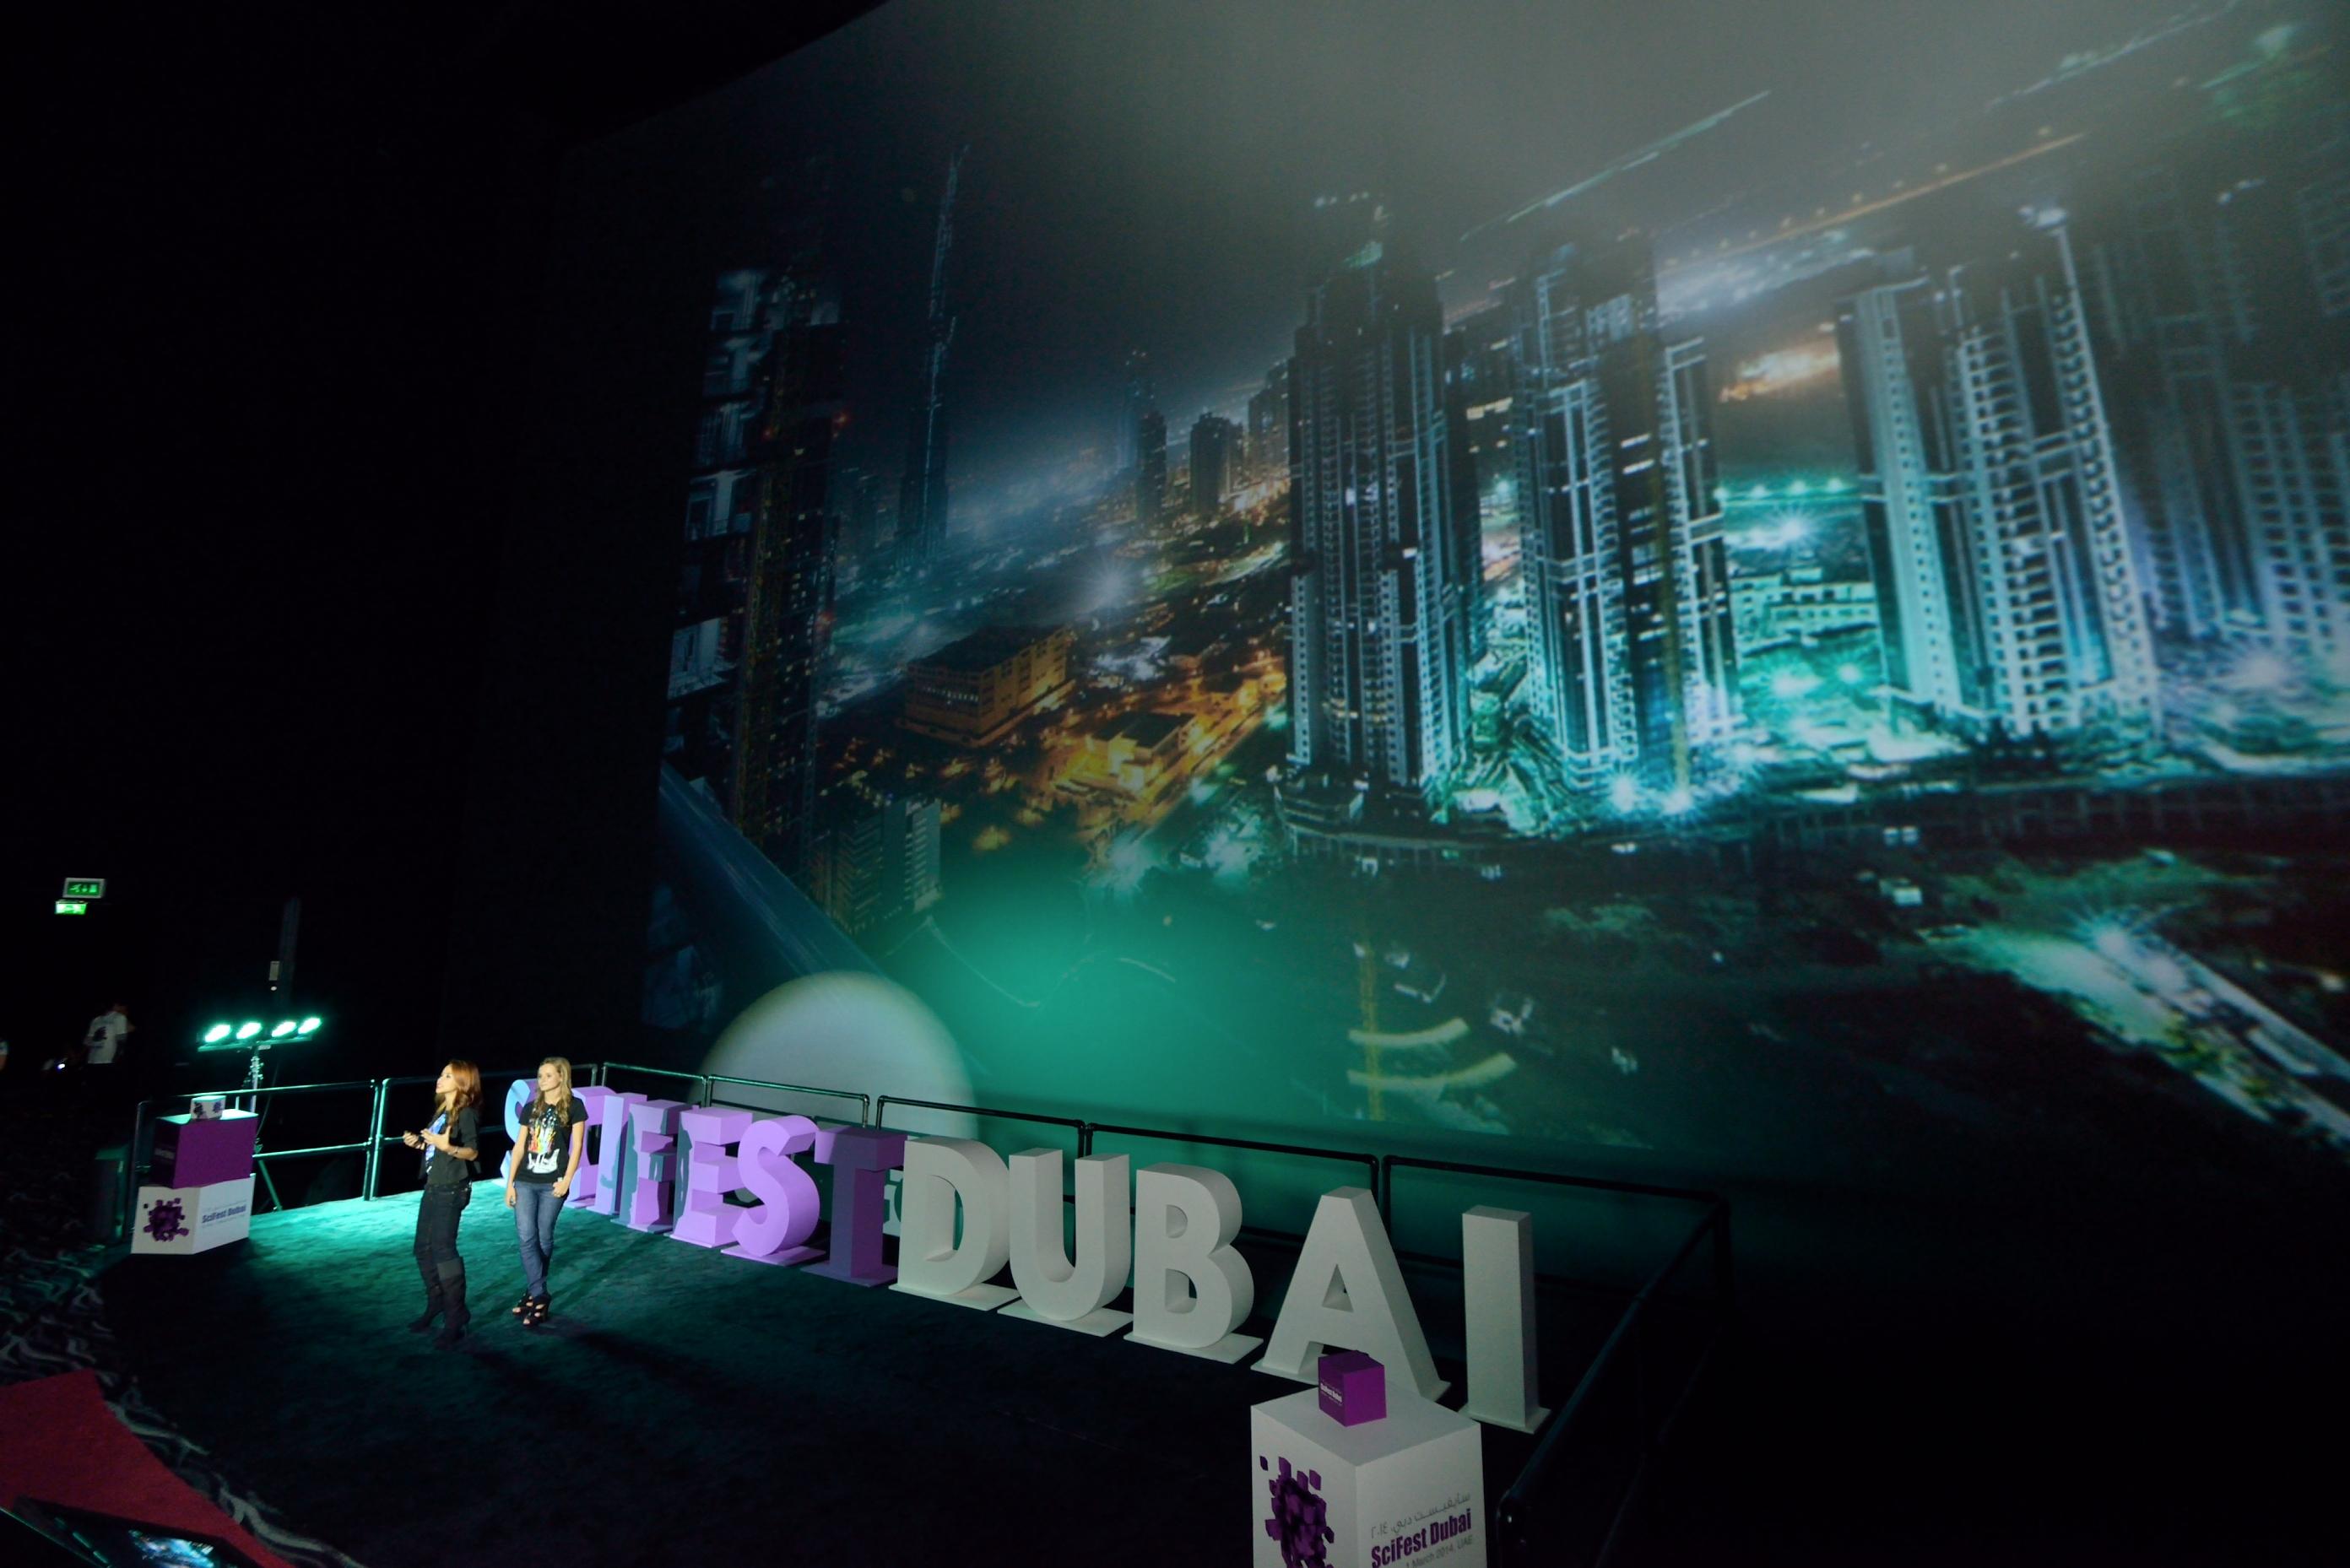 jonerona 2014_02_26 201 SciFest Dubai.JPG